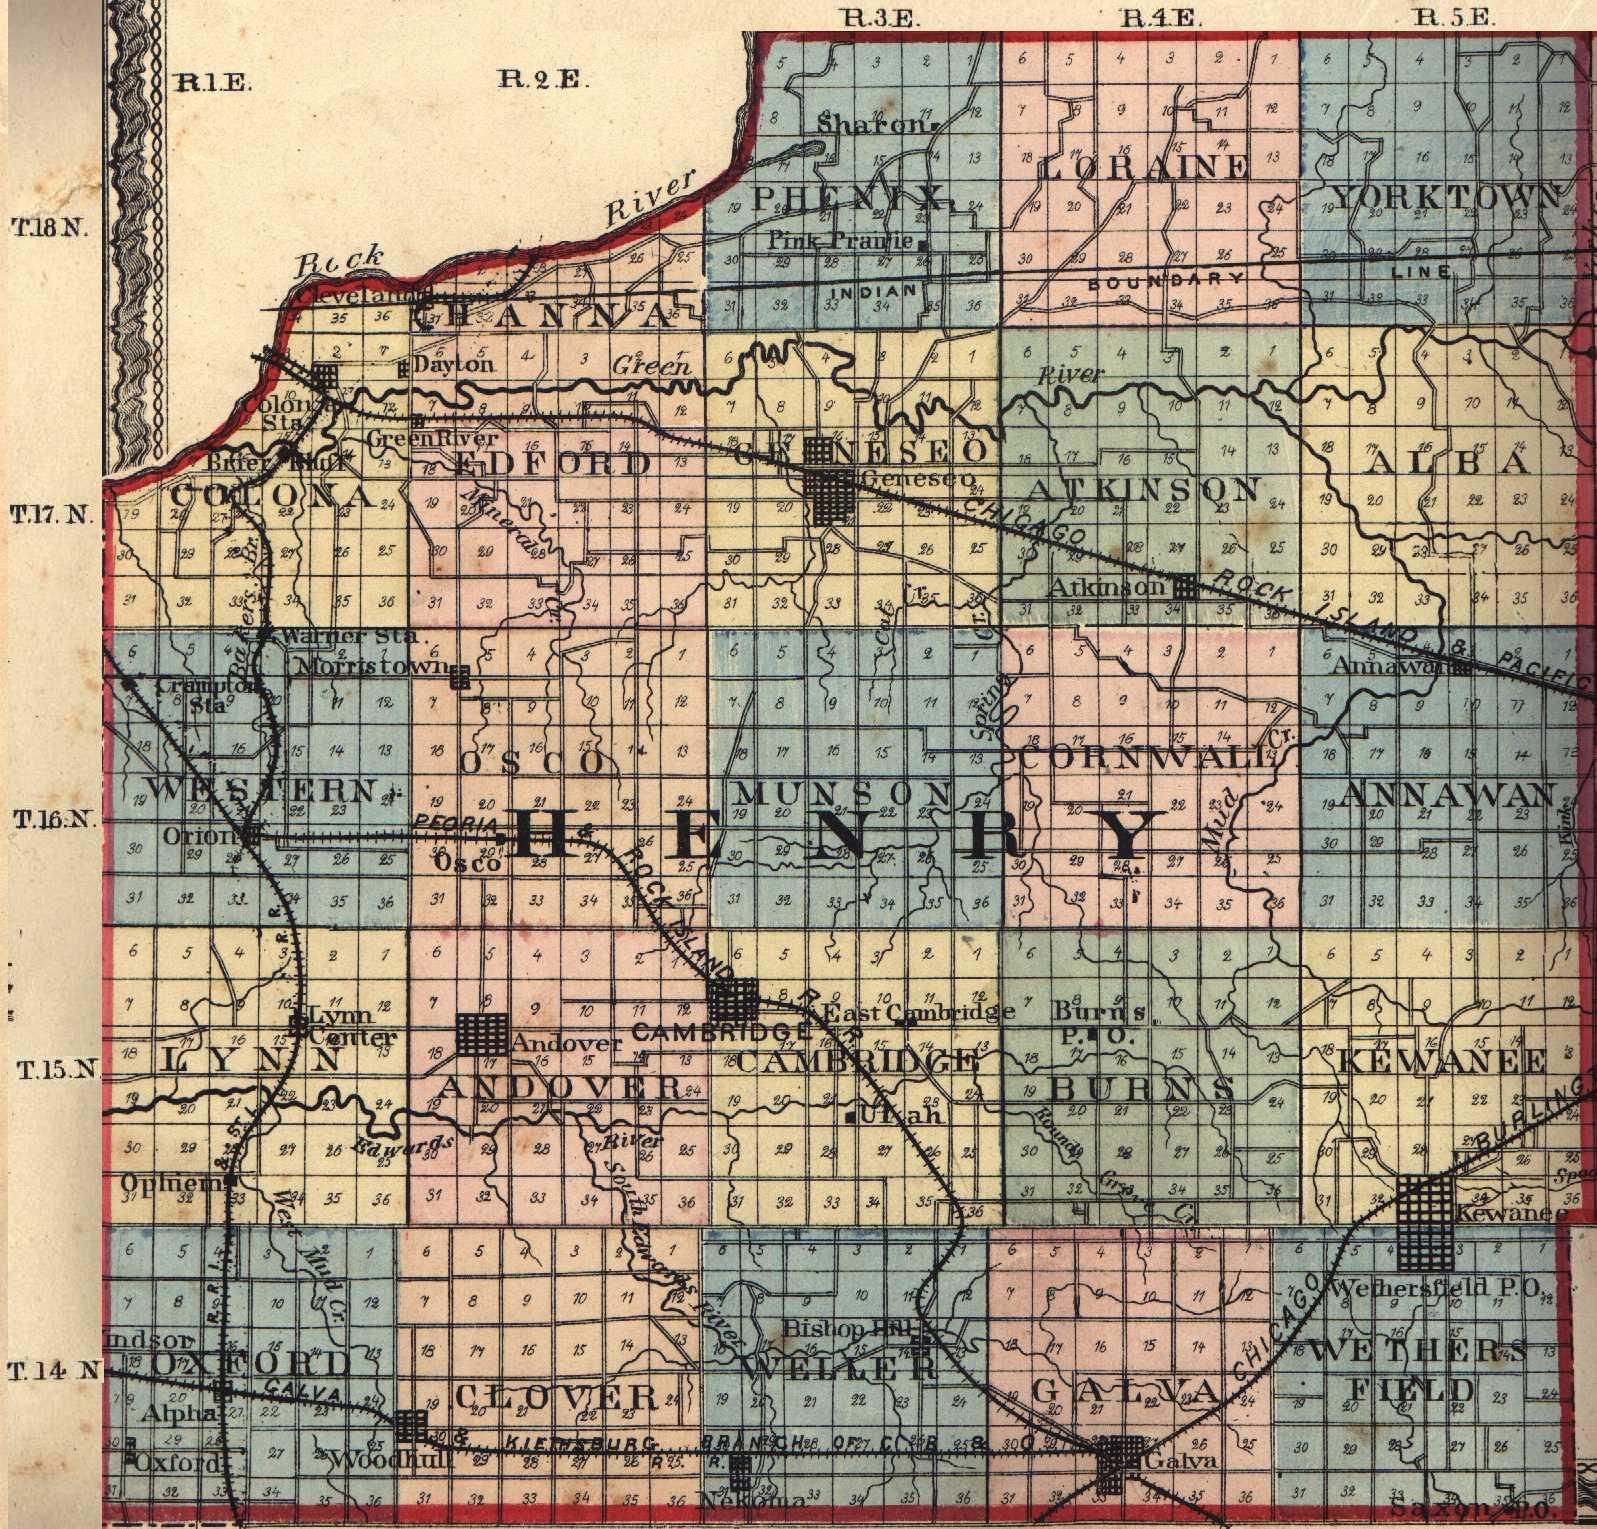 Kewanee Illinois Map.Henry County Illinois Maps And Gazetteers